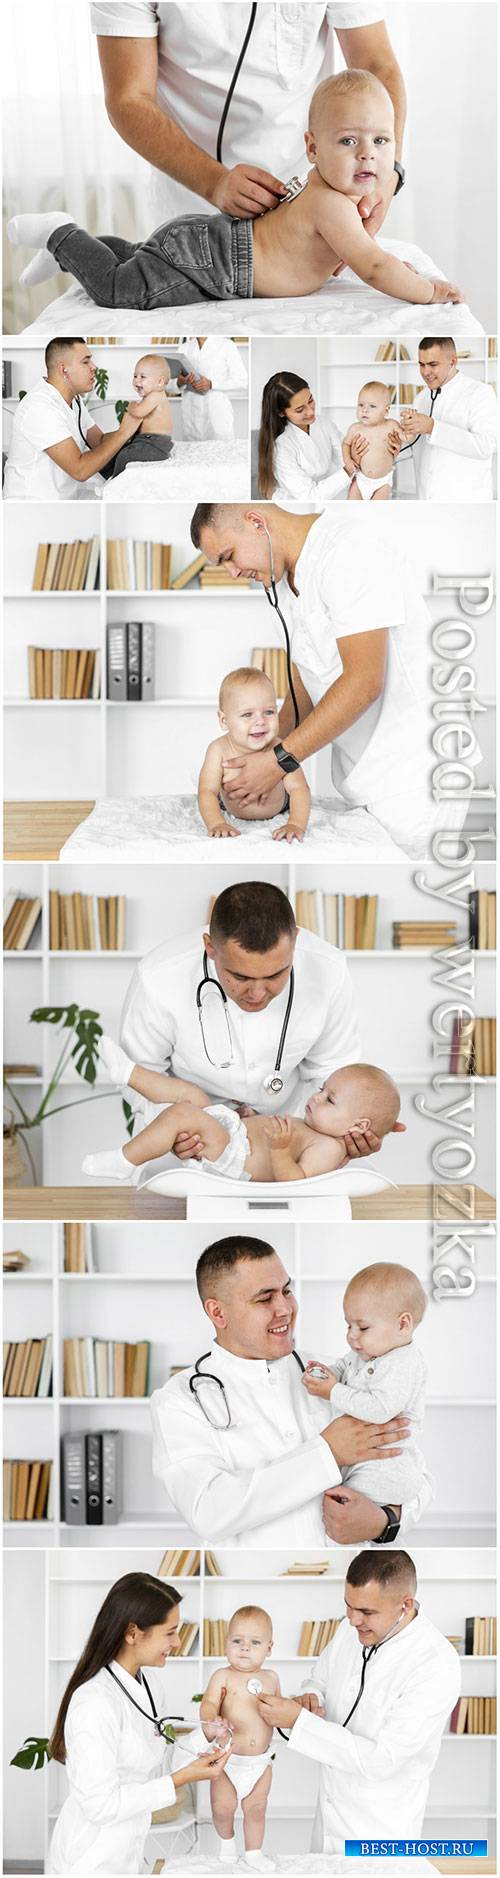 Doctor hands listening little baby stock photo